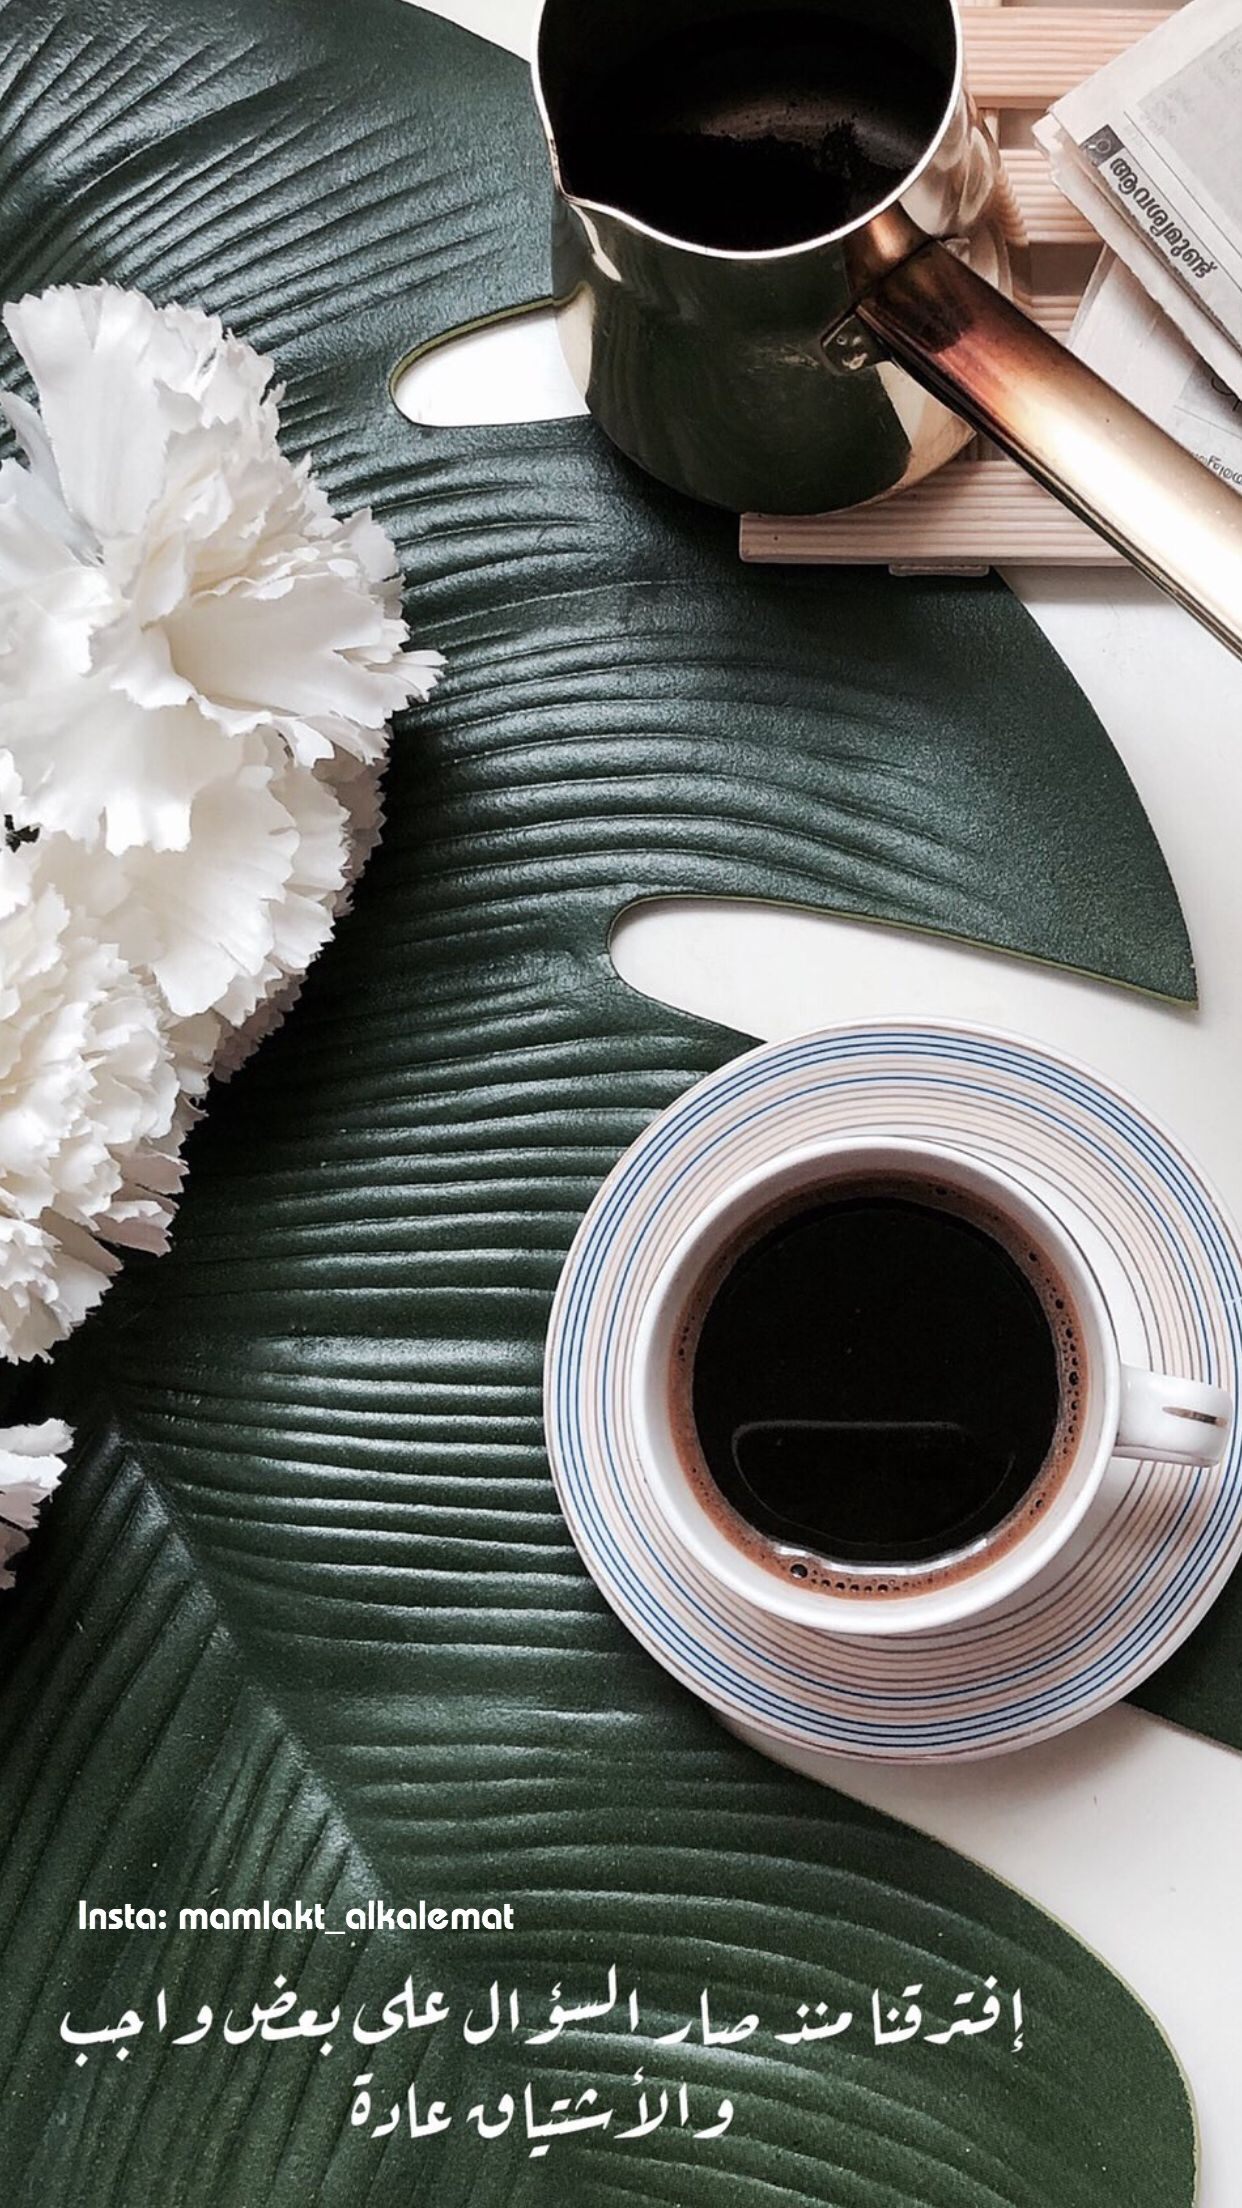 Pin By الجازي الجازي On اعجبني My Coffee Coffee Glassware